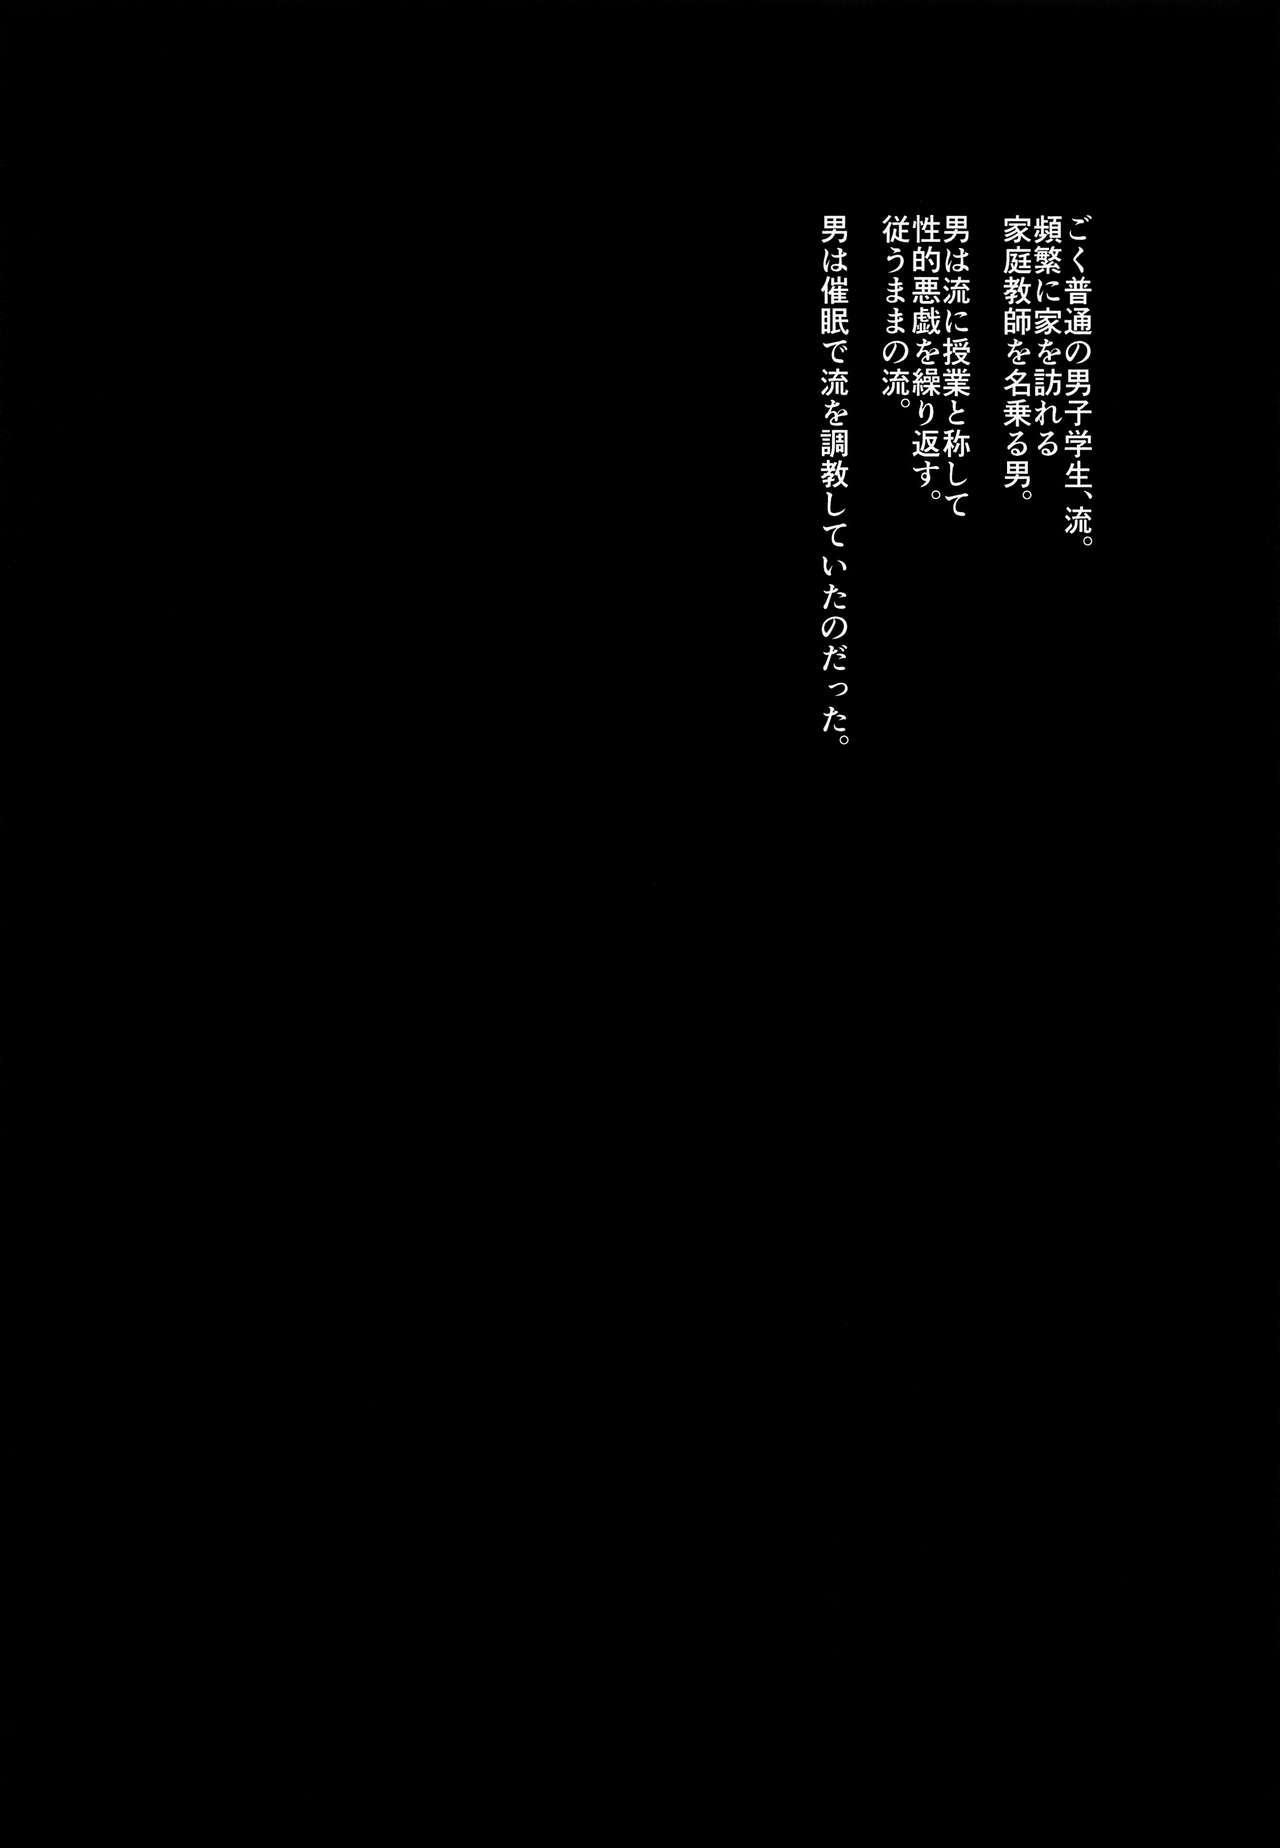 Kyou mo Kateikyoushi ga Kite Kyousei Mesuochi Saiminnjugyou o Suruhi 2